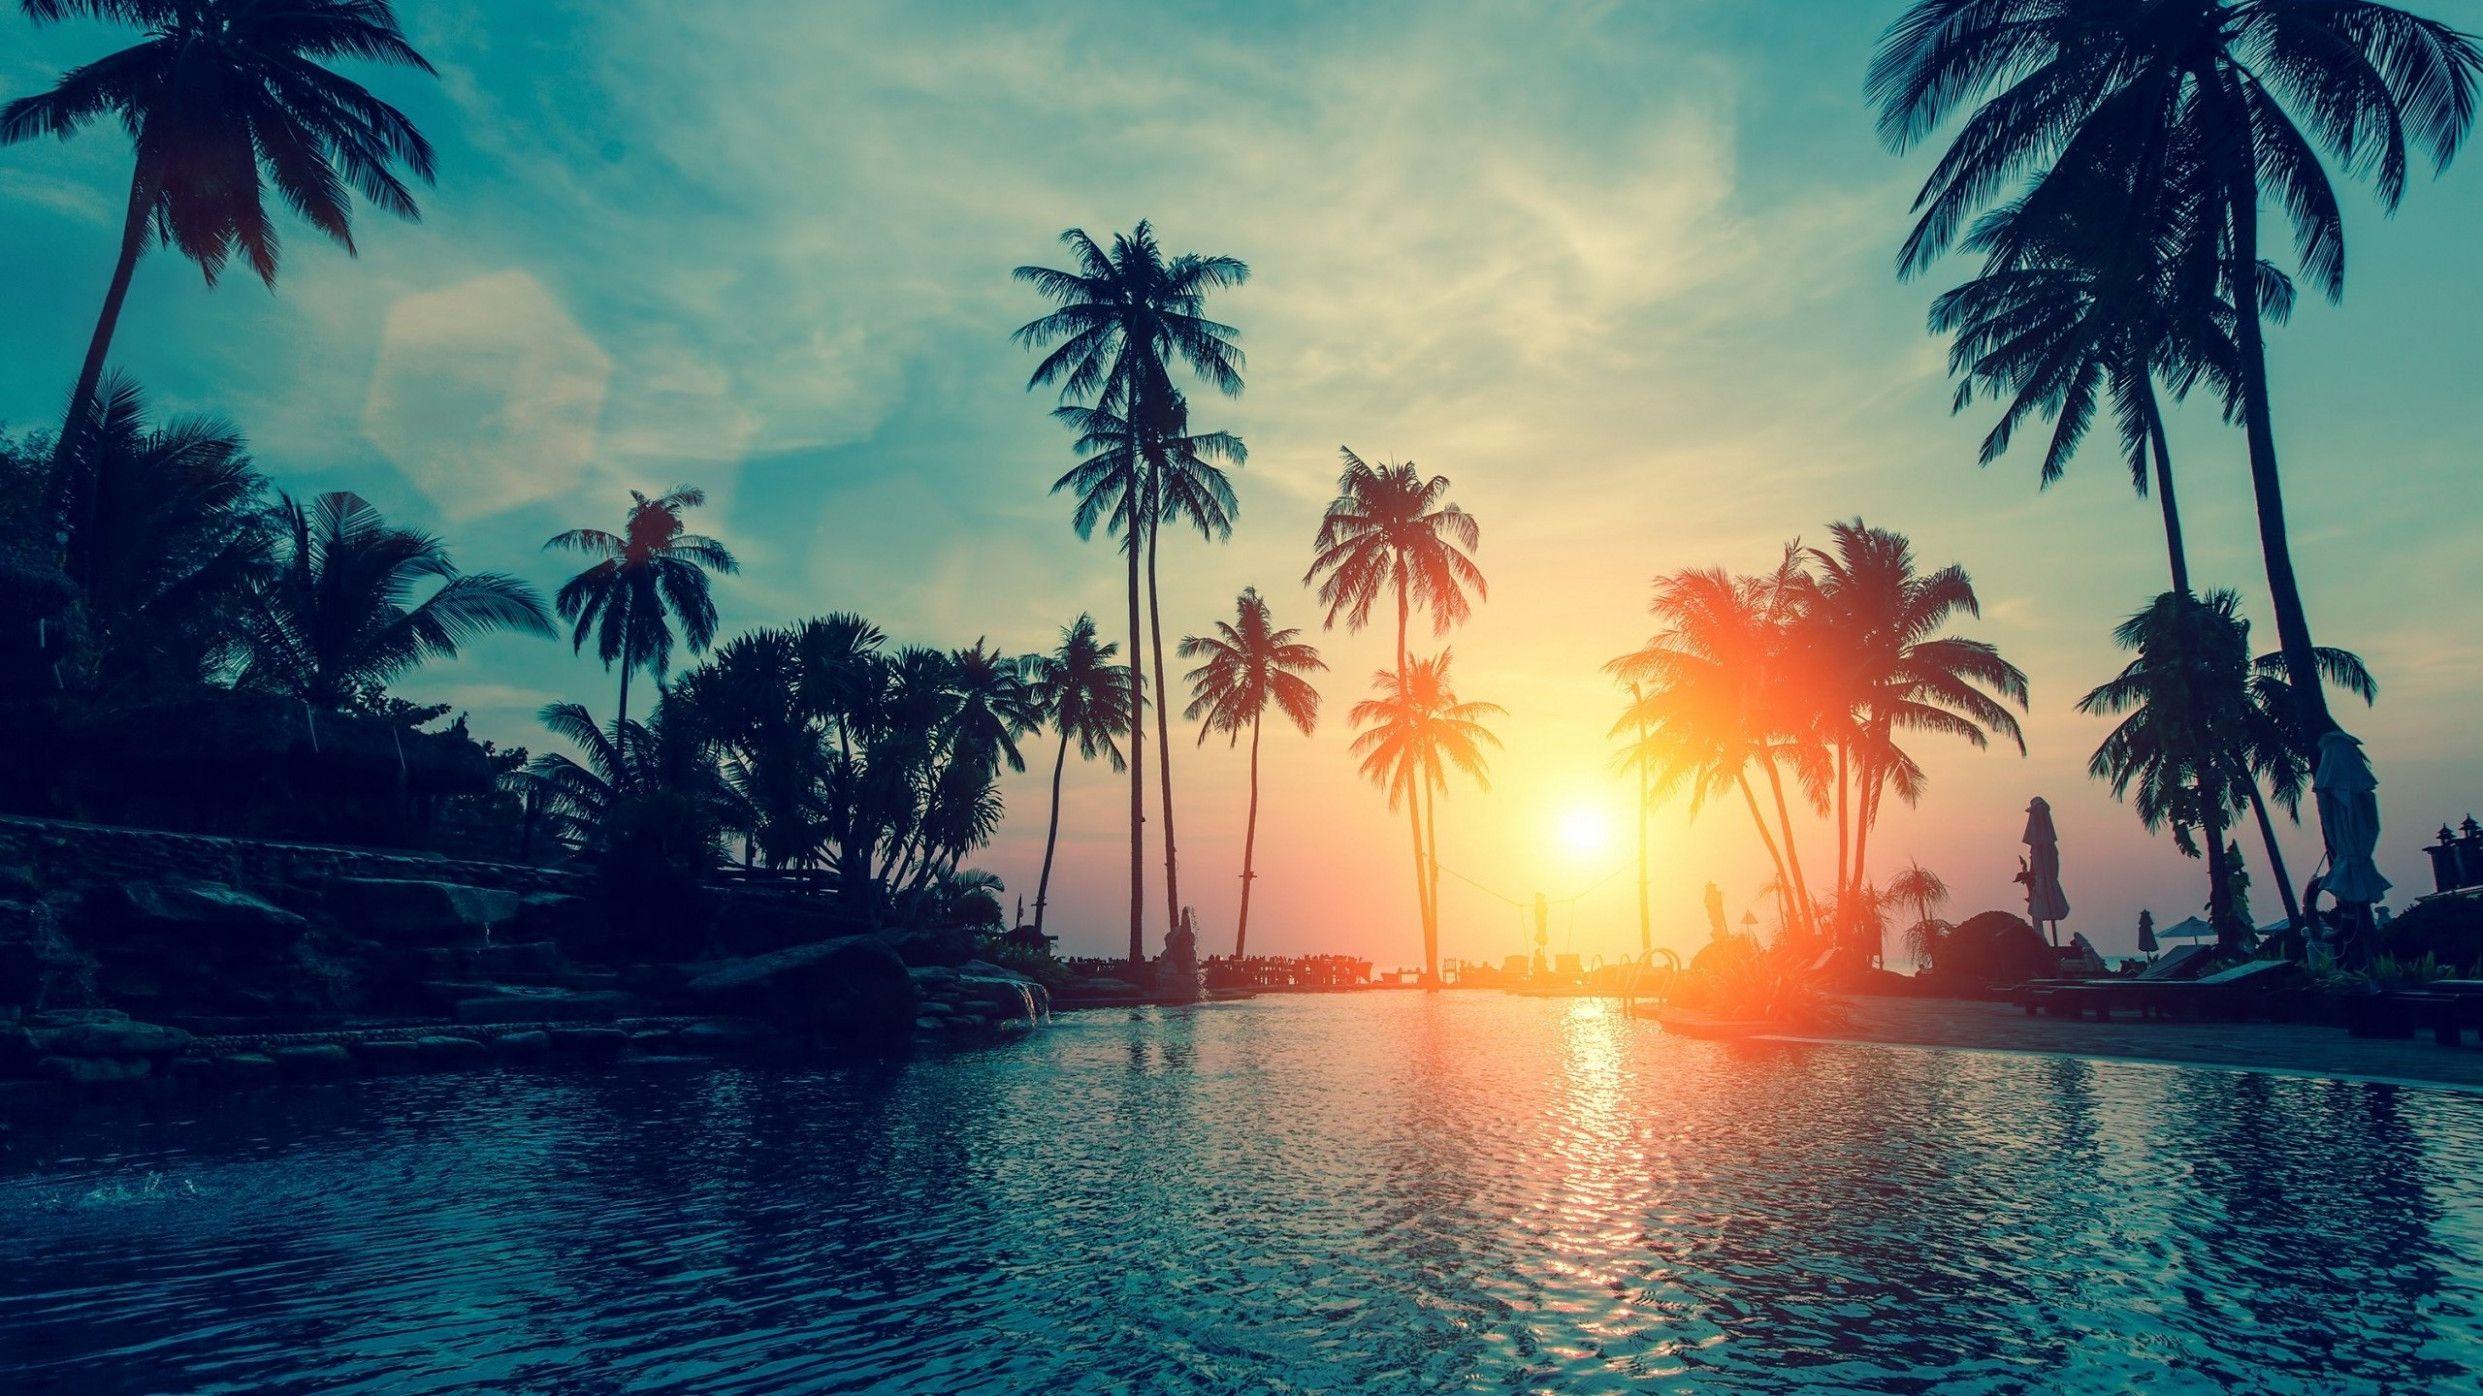 Sunset Beach Wedding Palm Trees Palm Trees Wallpaper Tree Hd Wallpaper Sunset Wallpaper